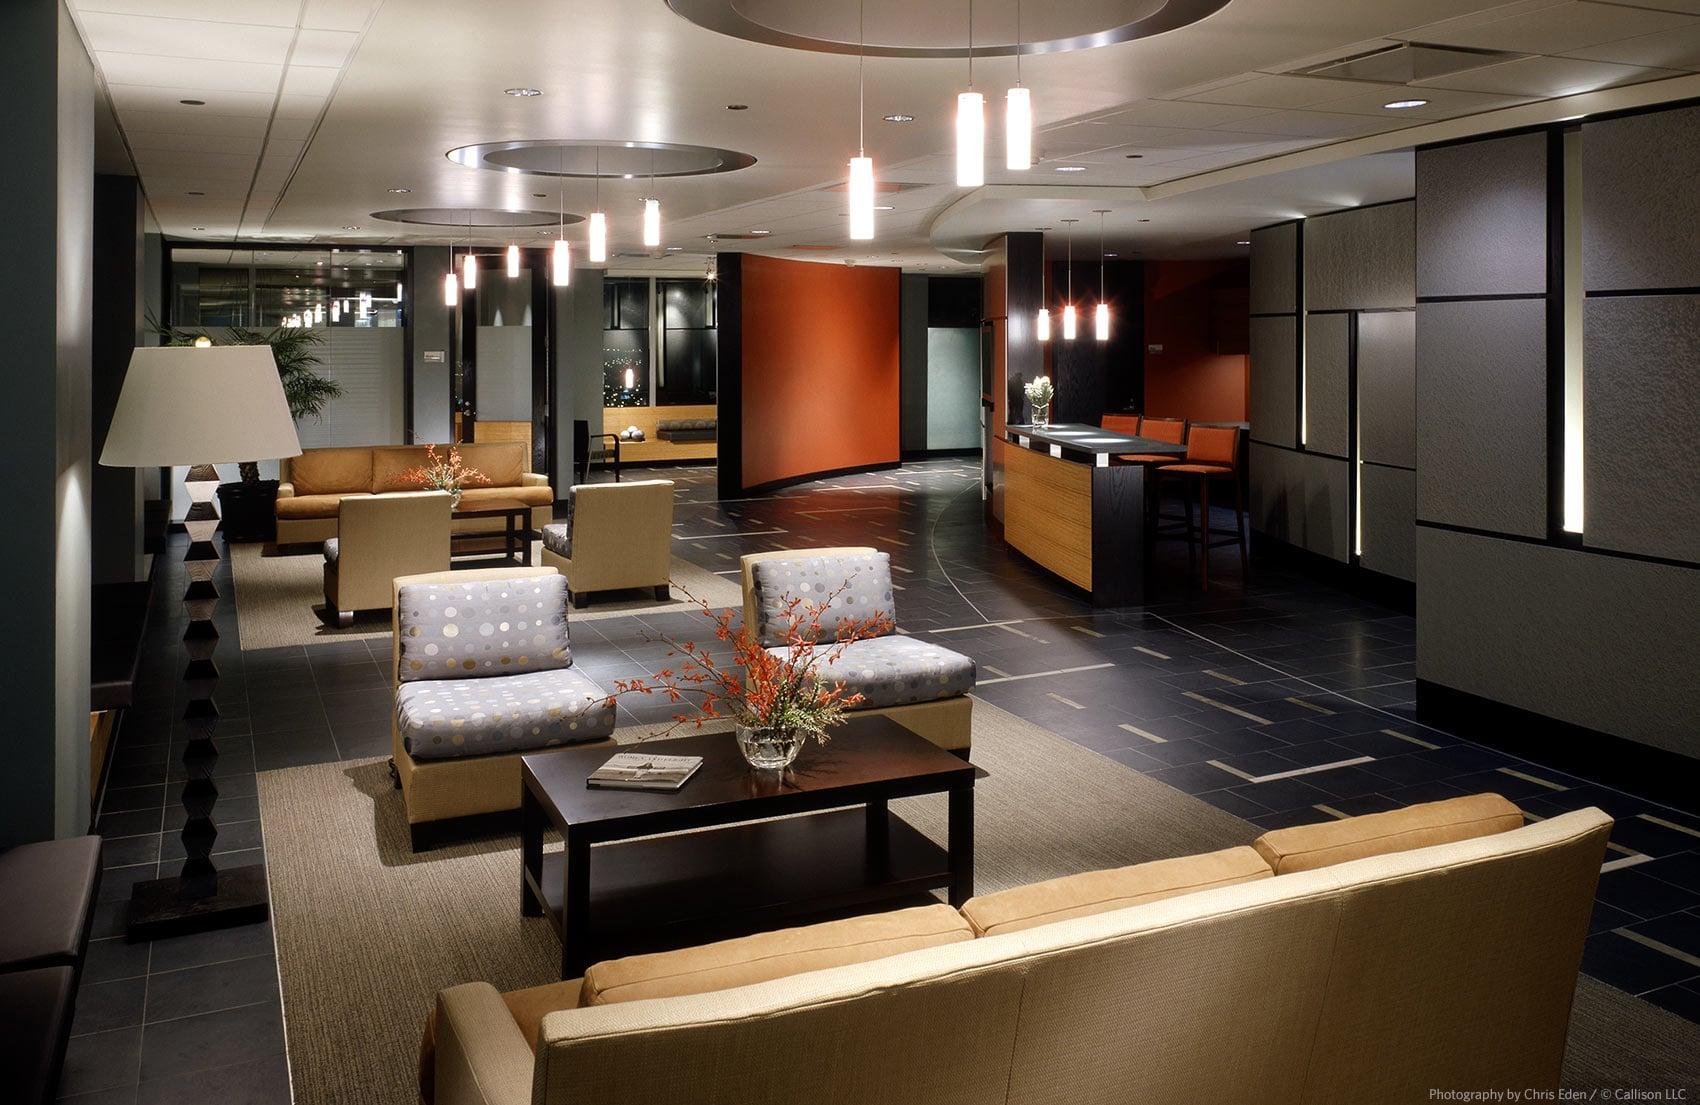 Boeing HQ - Main Lobby interior